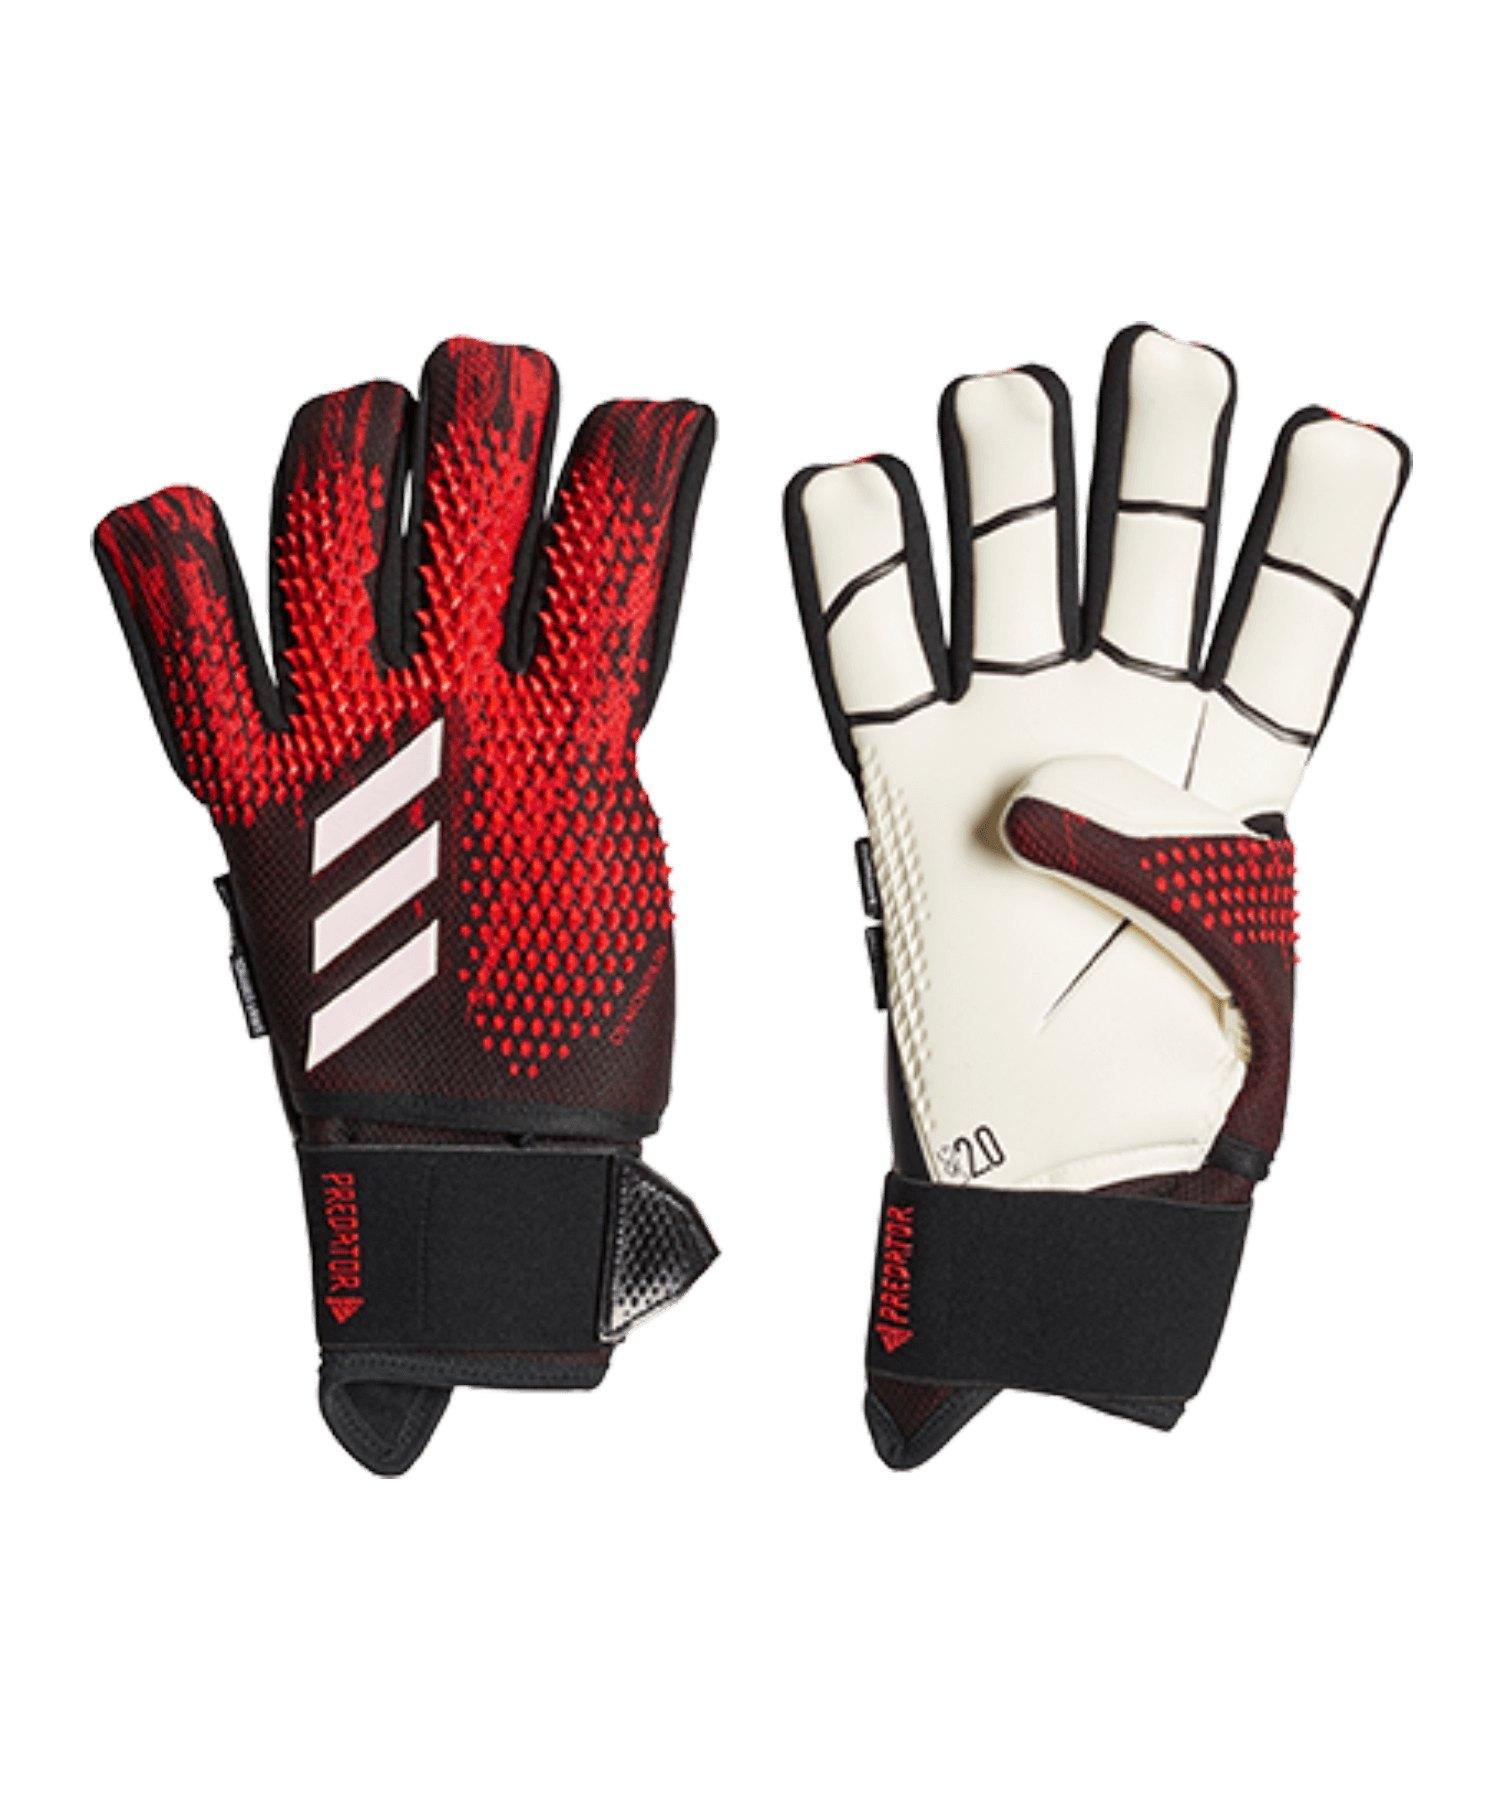 adidas Predator Pro Ultimate TW-Handschuh Schwarz - schwarz